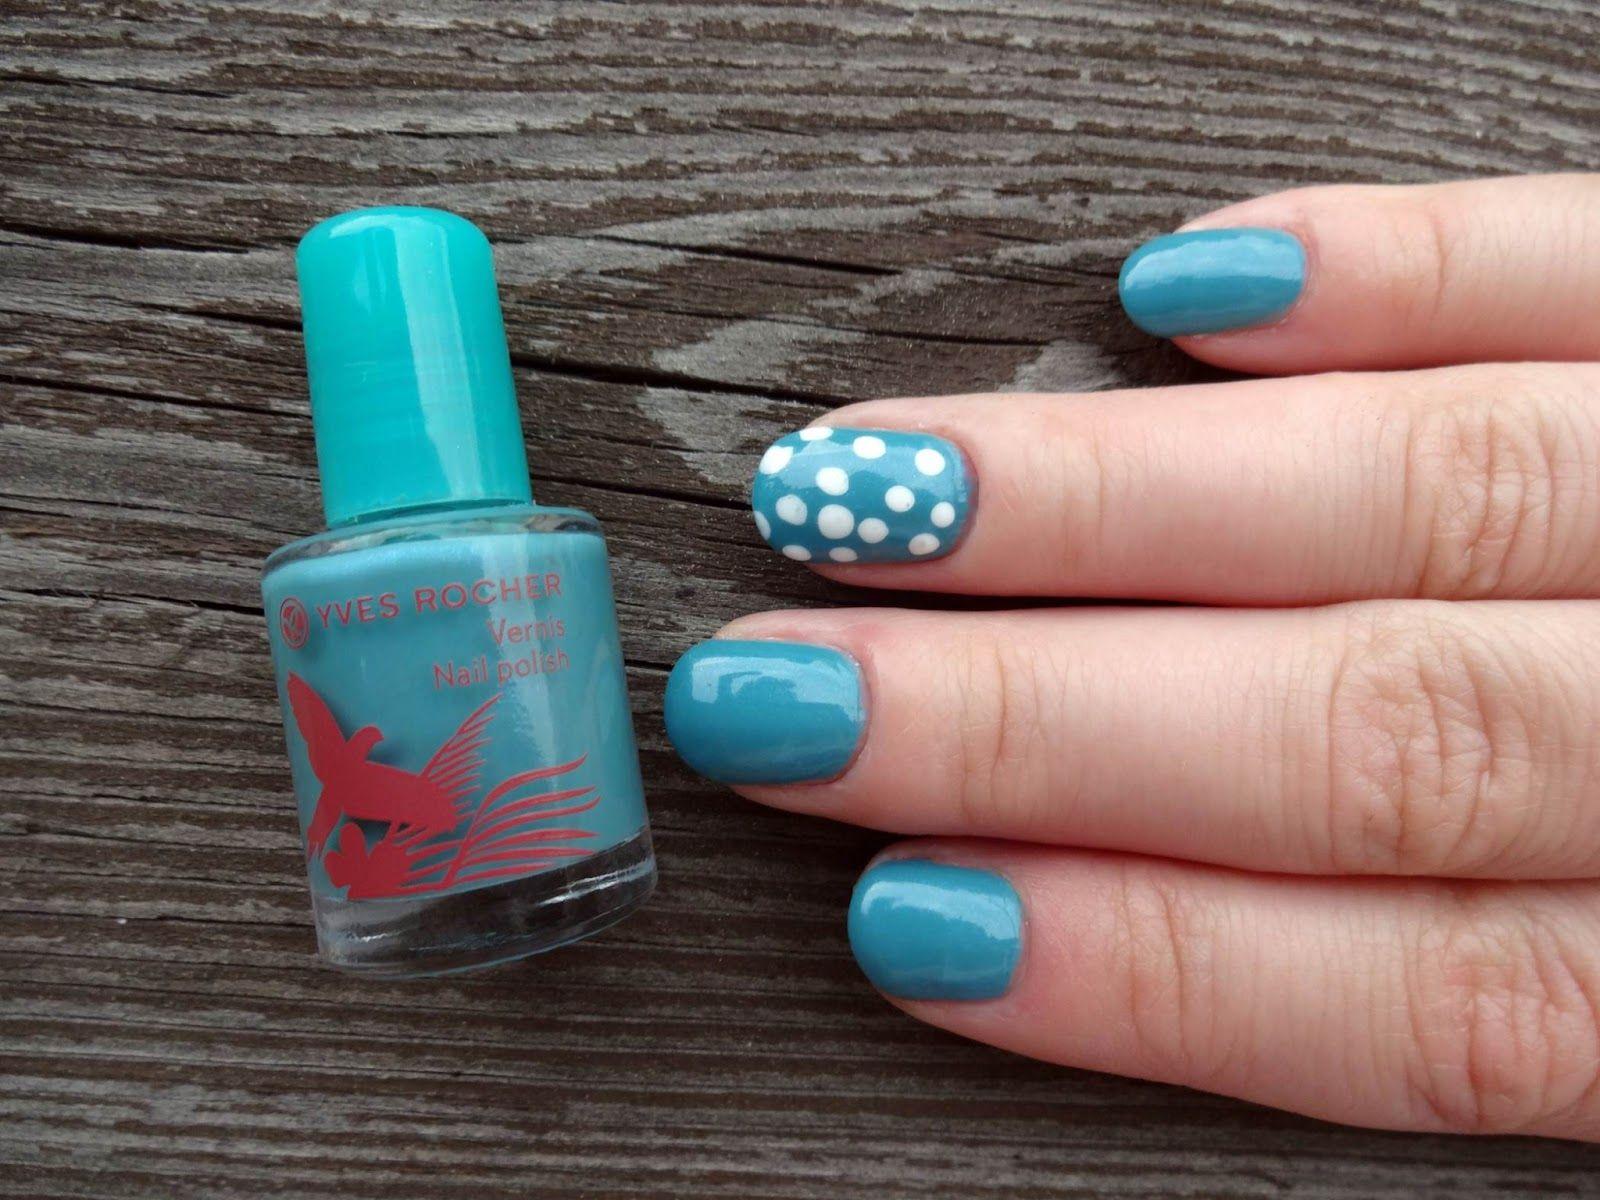 Yves Rocher - Bermuda Blau (Nagellack) | Nail Arts | Pinterest ...